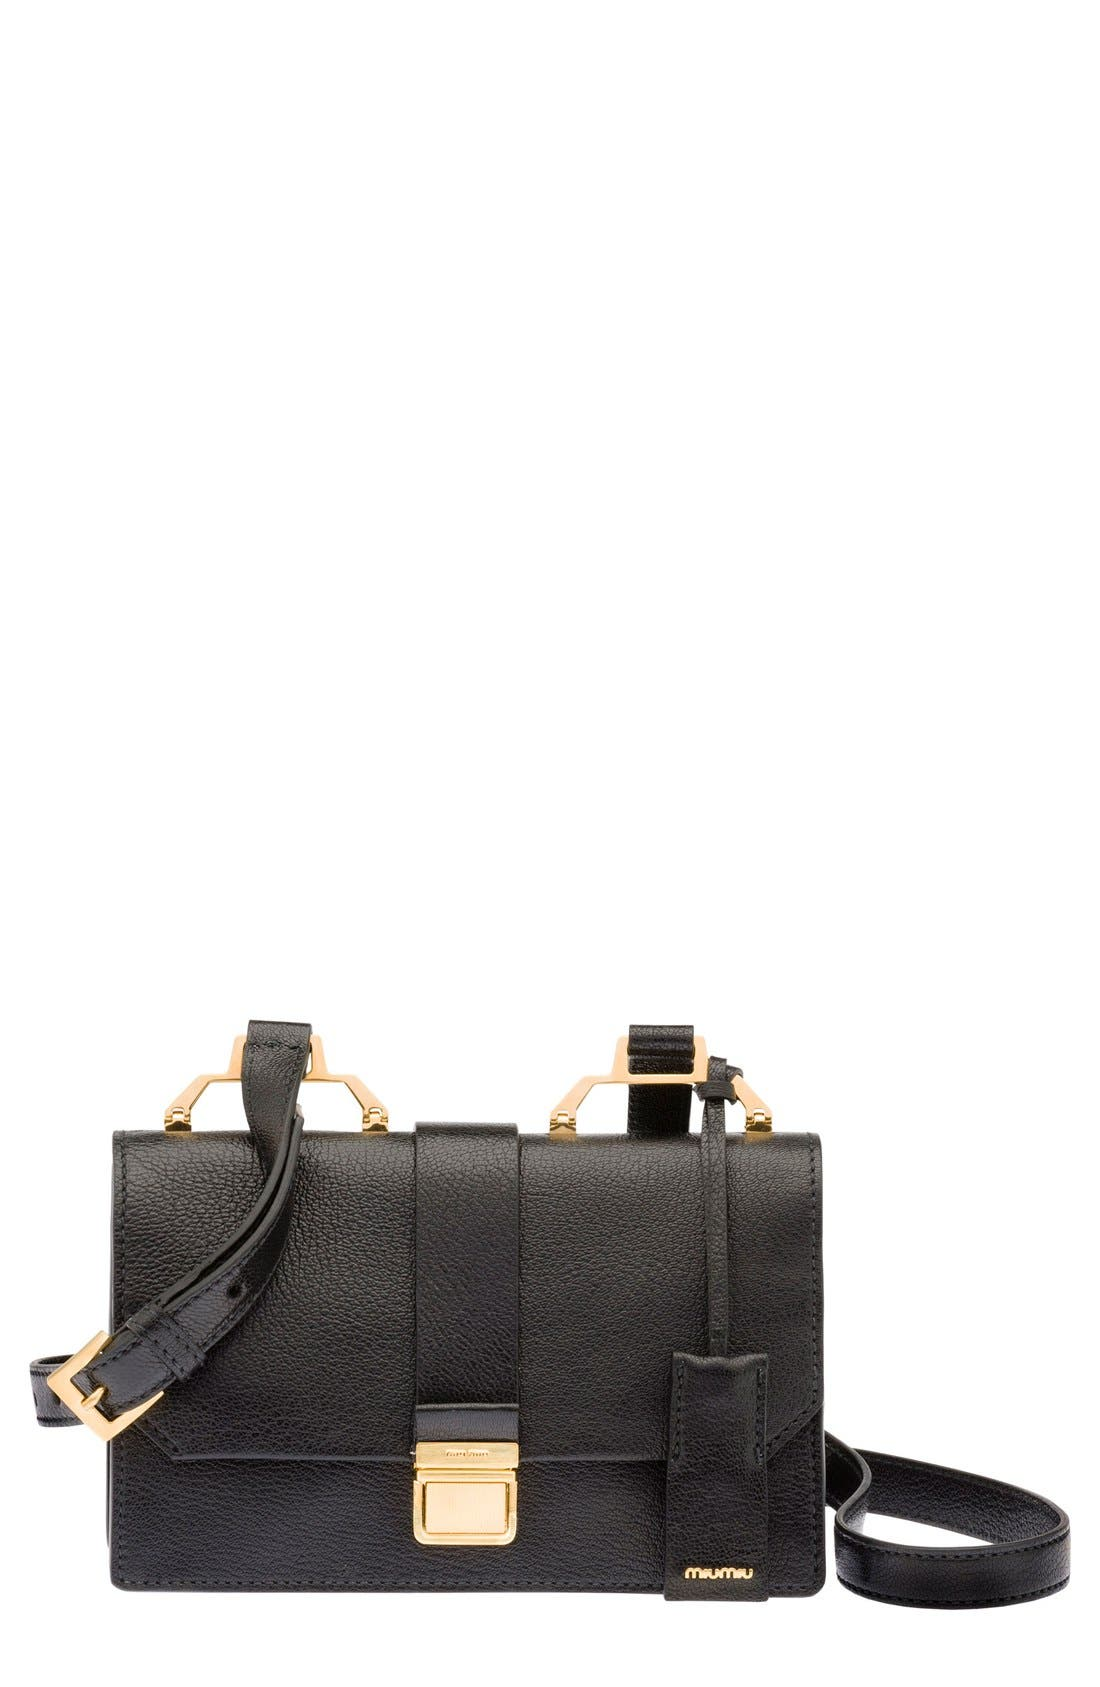 Main Image - Miu Miu 'Small Madras' Goatskin Leather Shoulder Bag